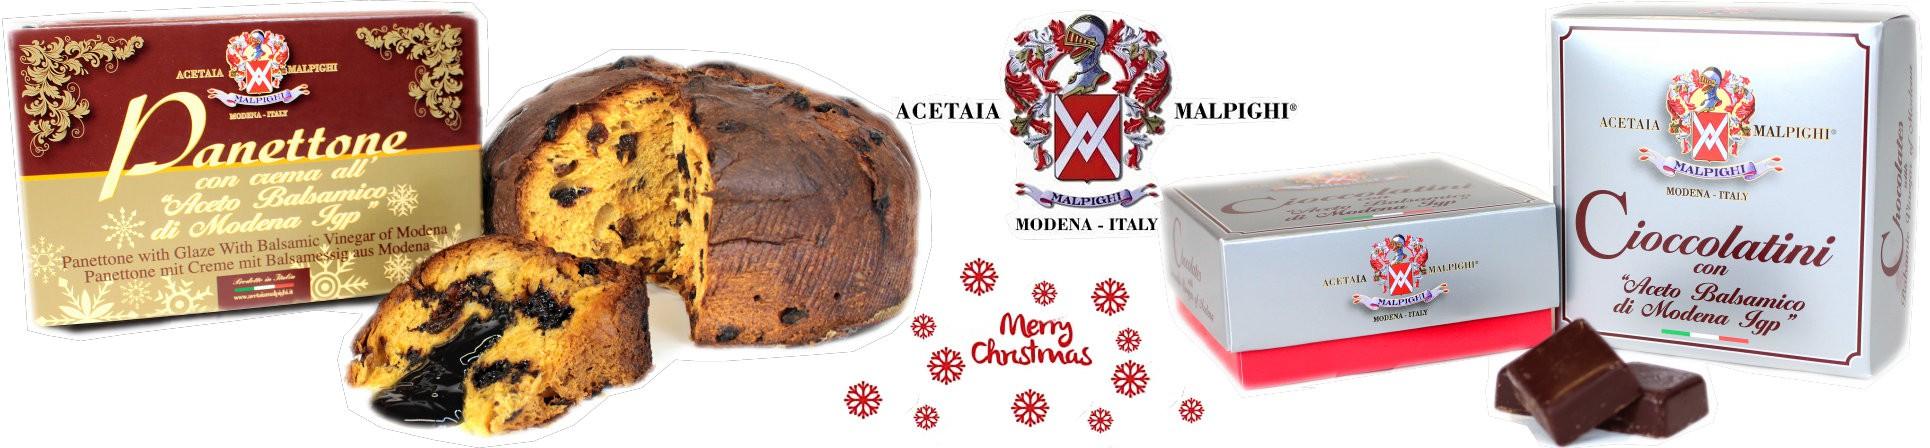 vendita online panettone all'aceto balsamico acquista online - ACETAIA MALPIGI